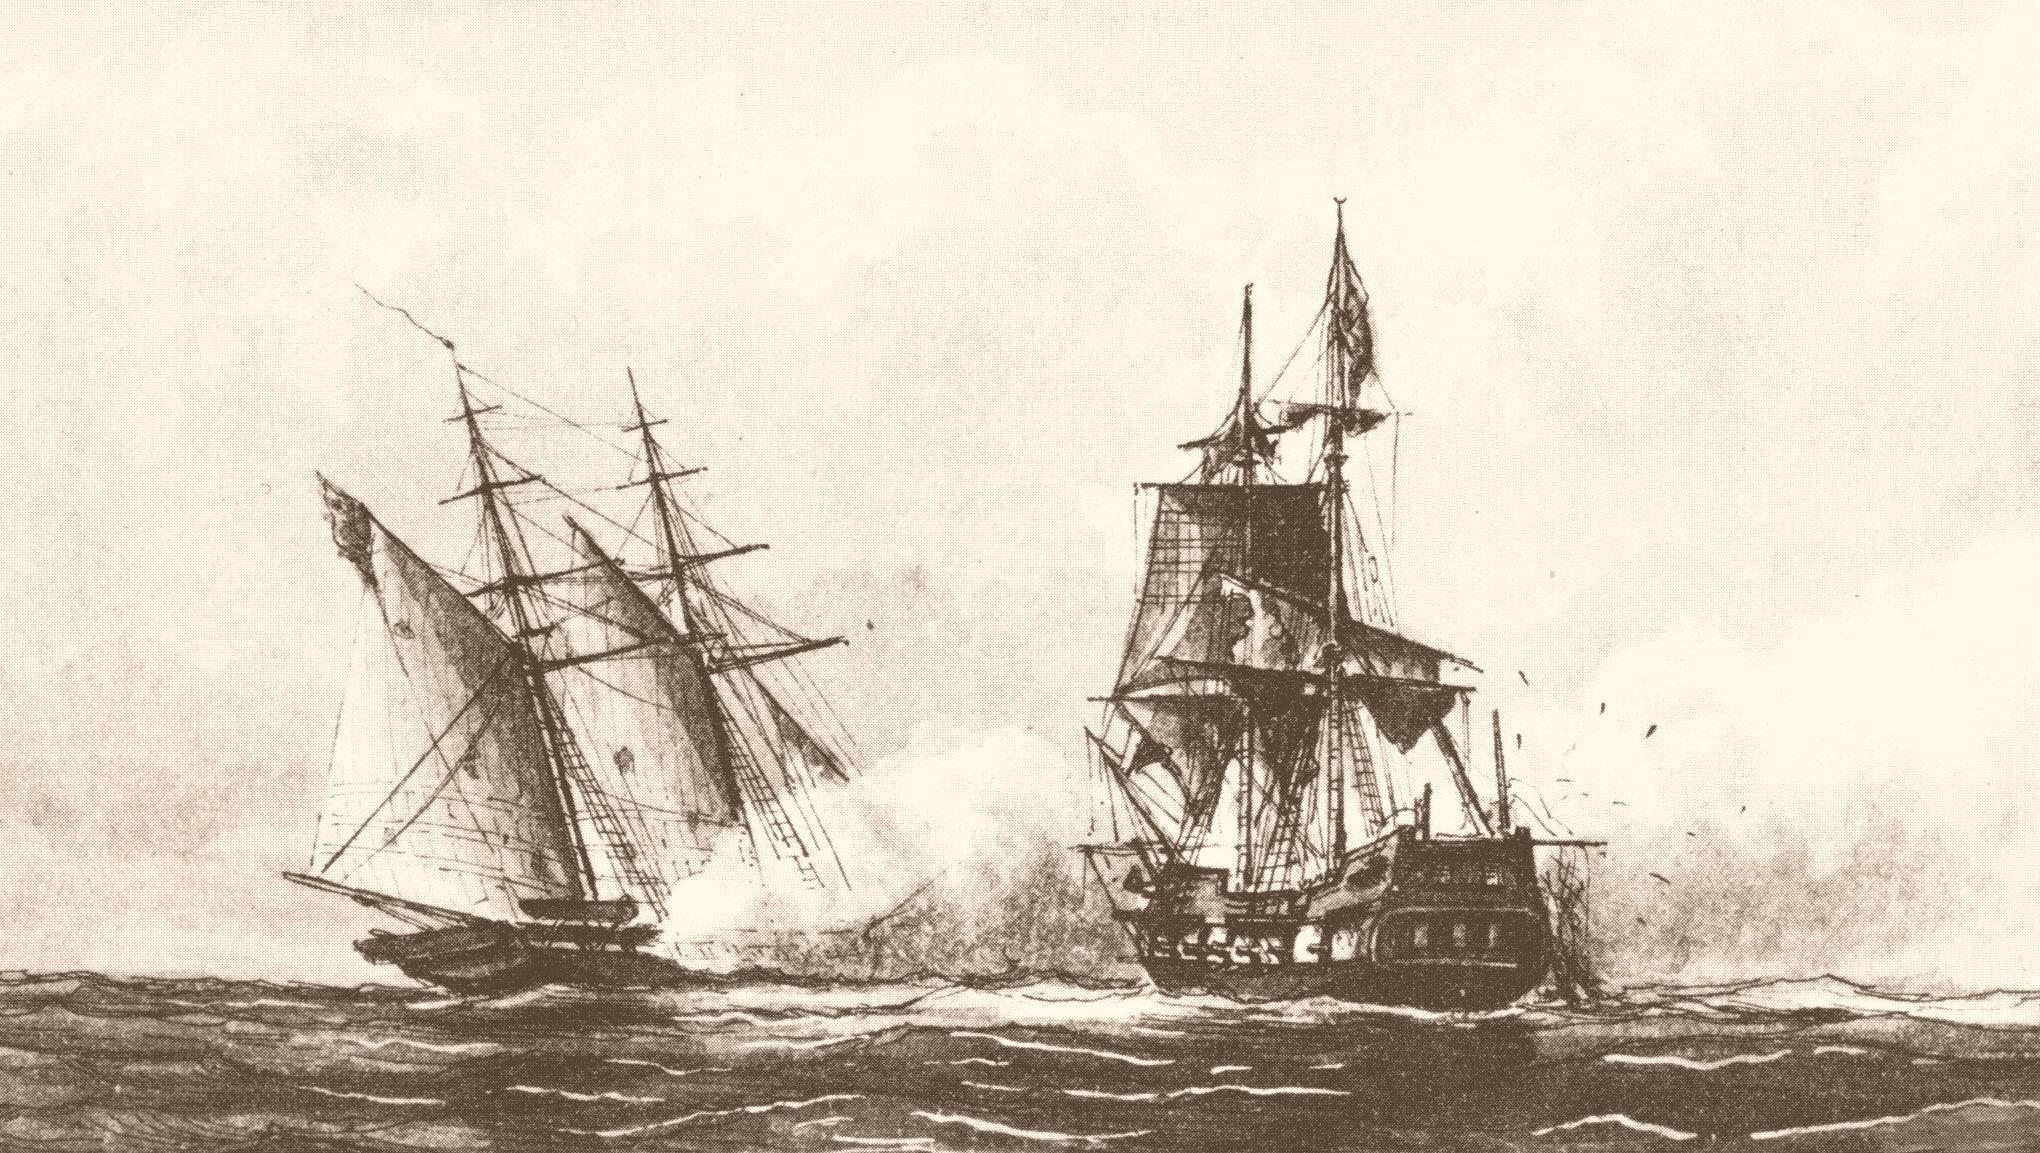 The schooner USS Enterprise captures the corsair Tripoli during battle.